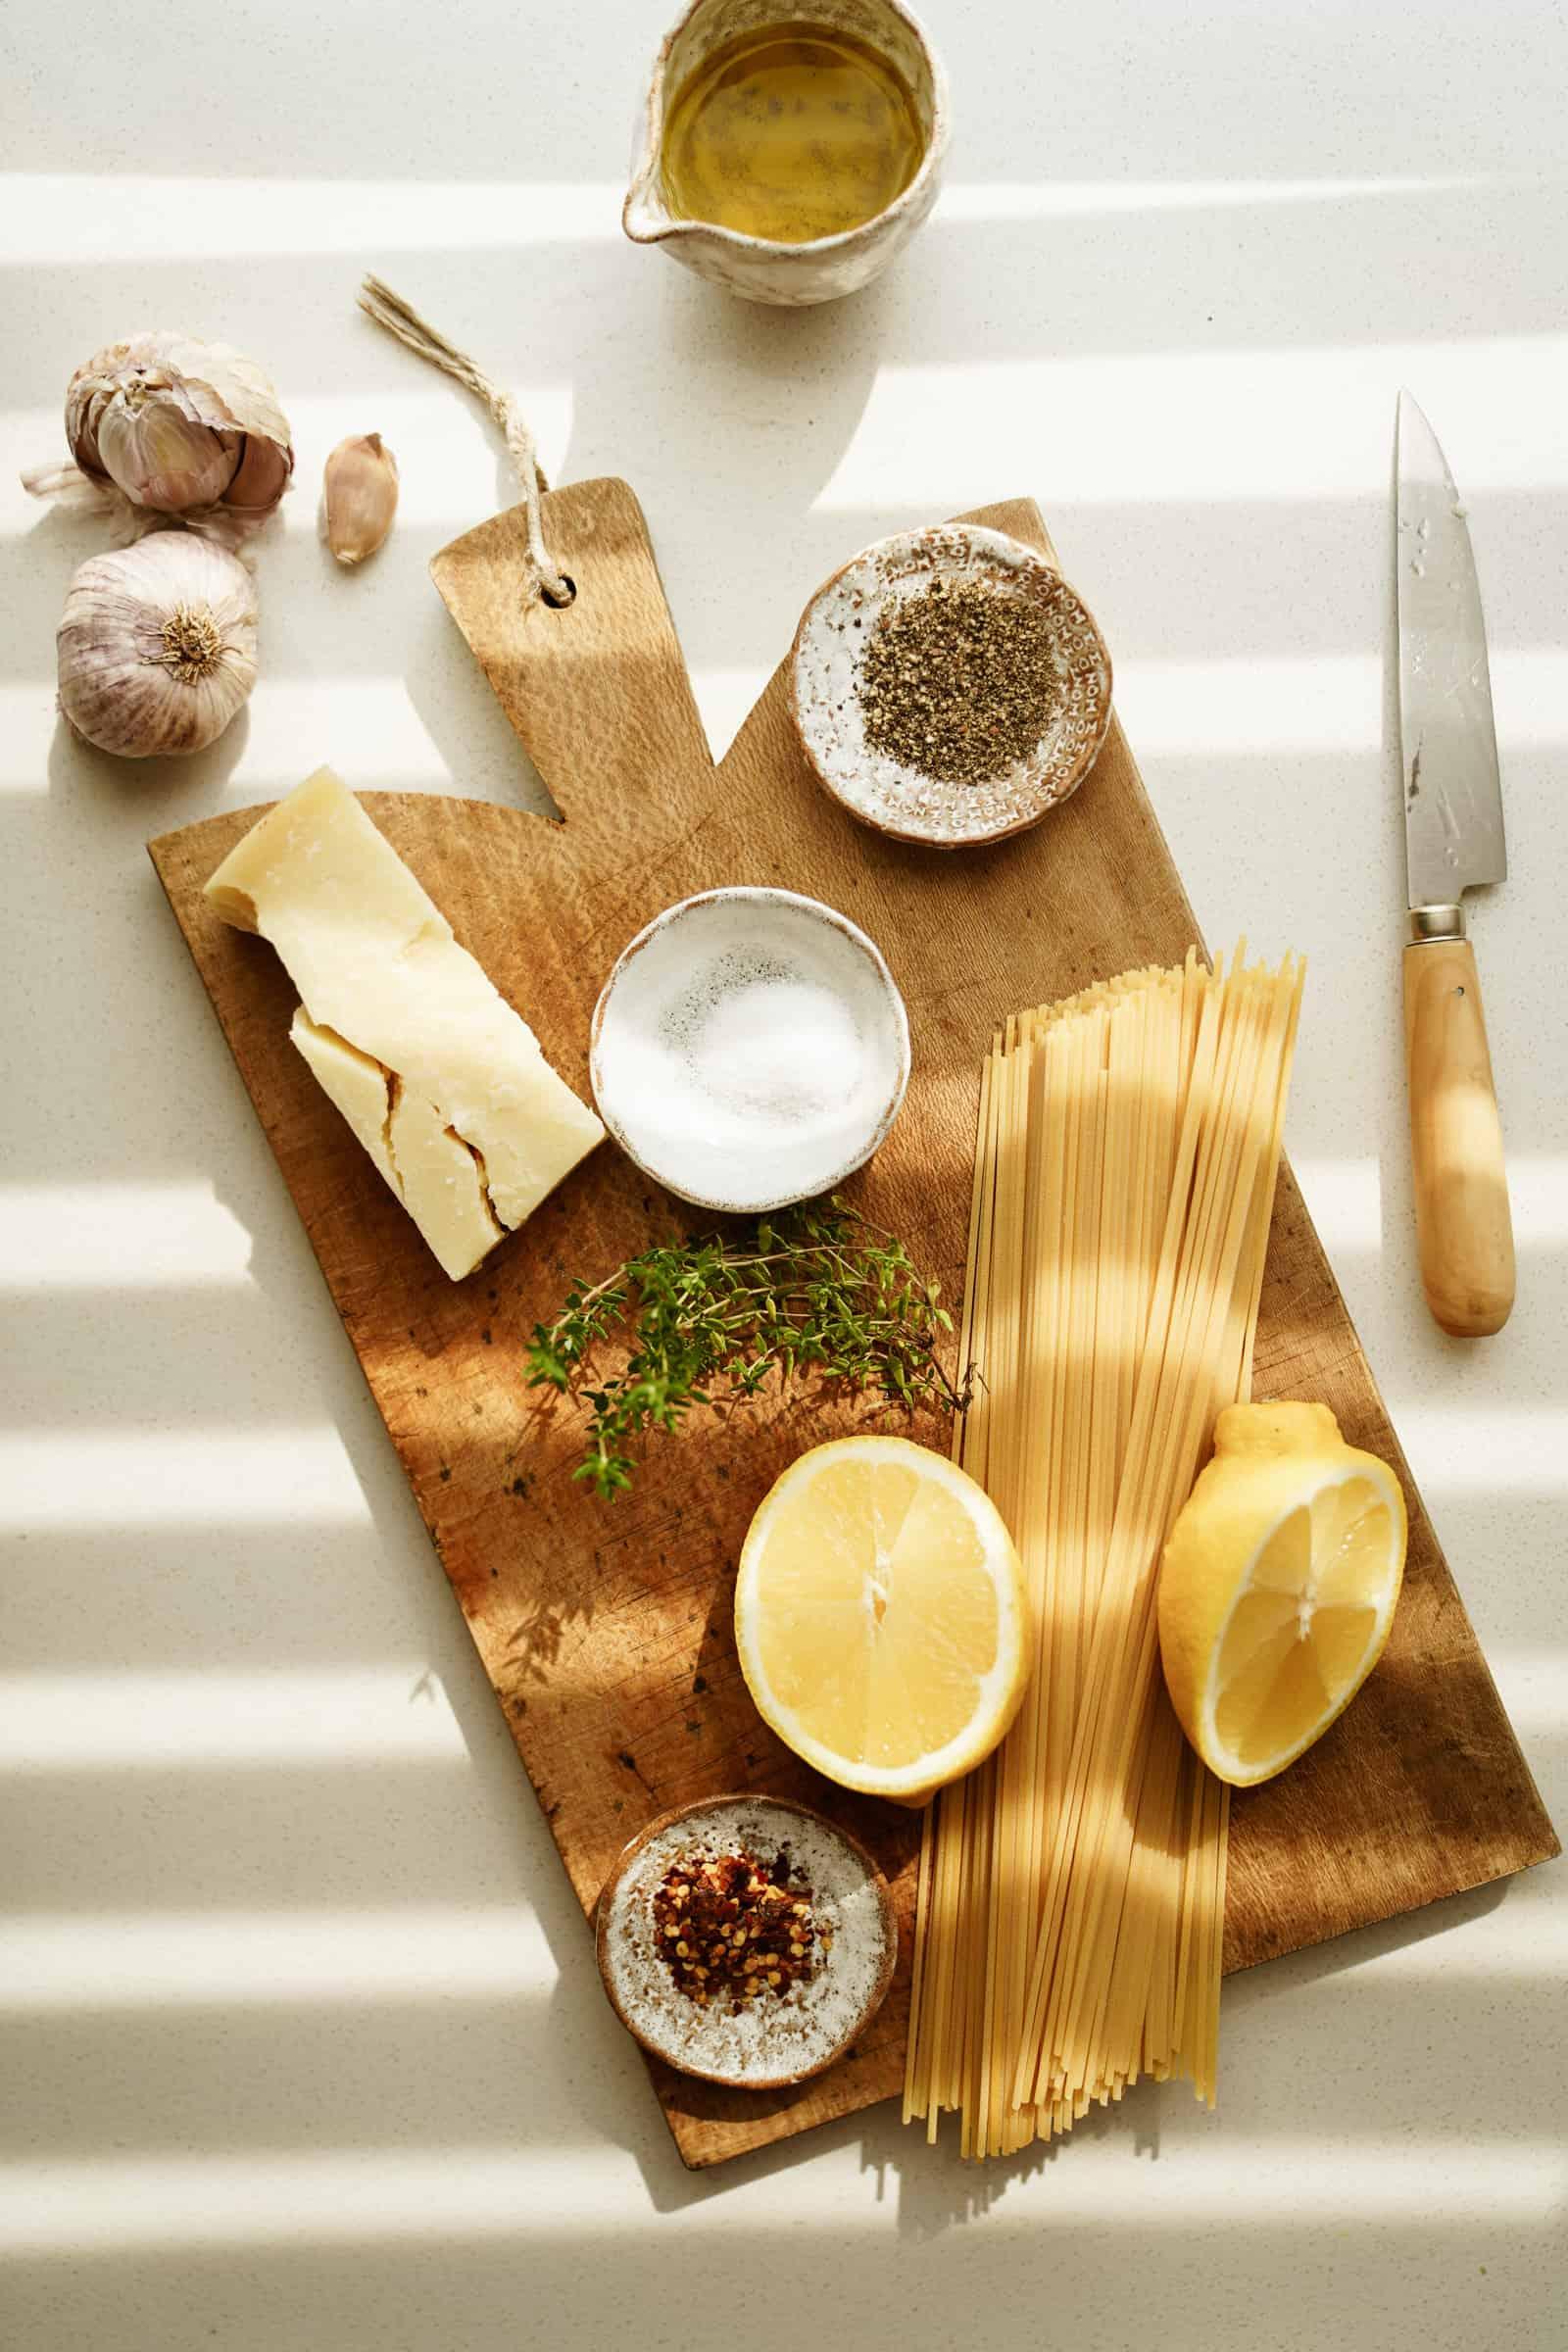 Ingredients for aglio e olio